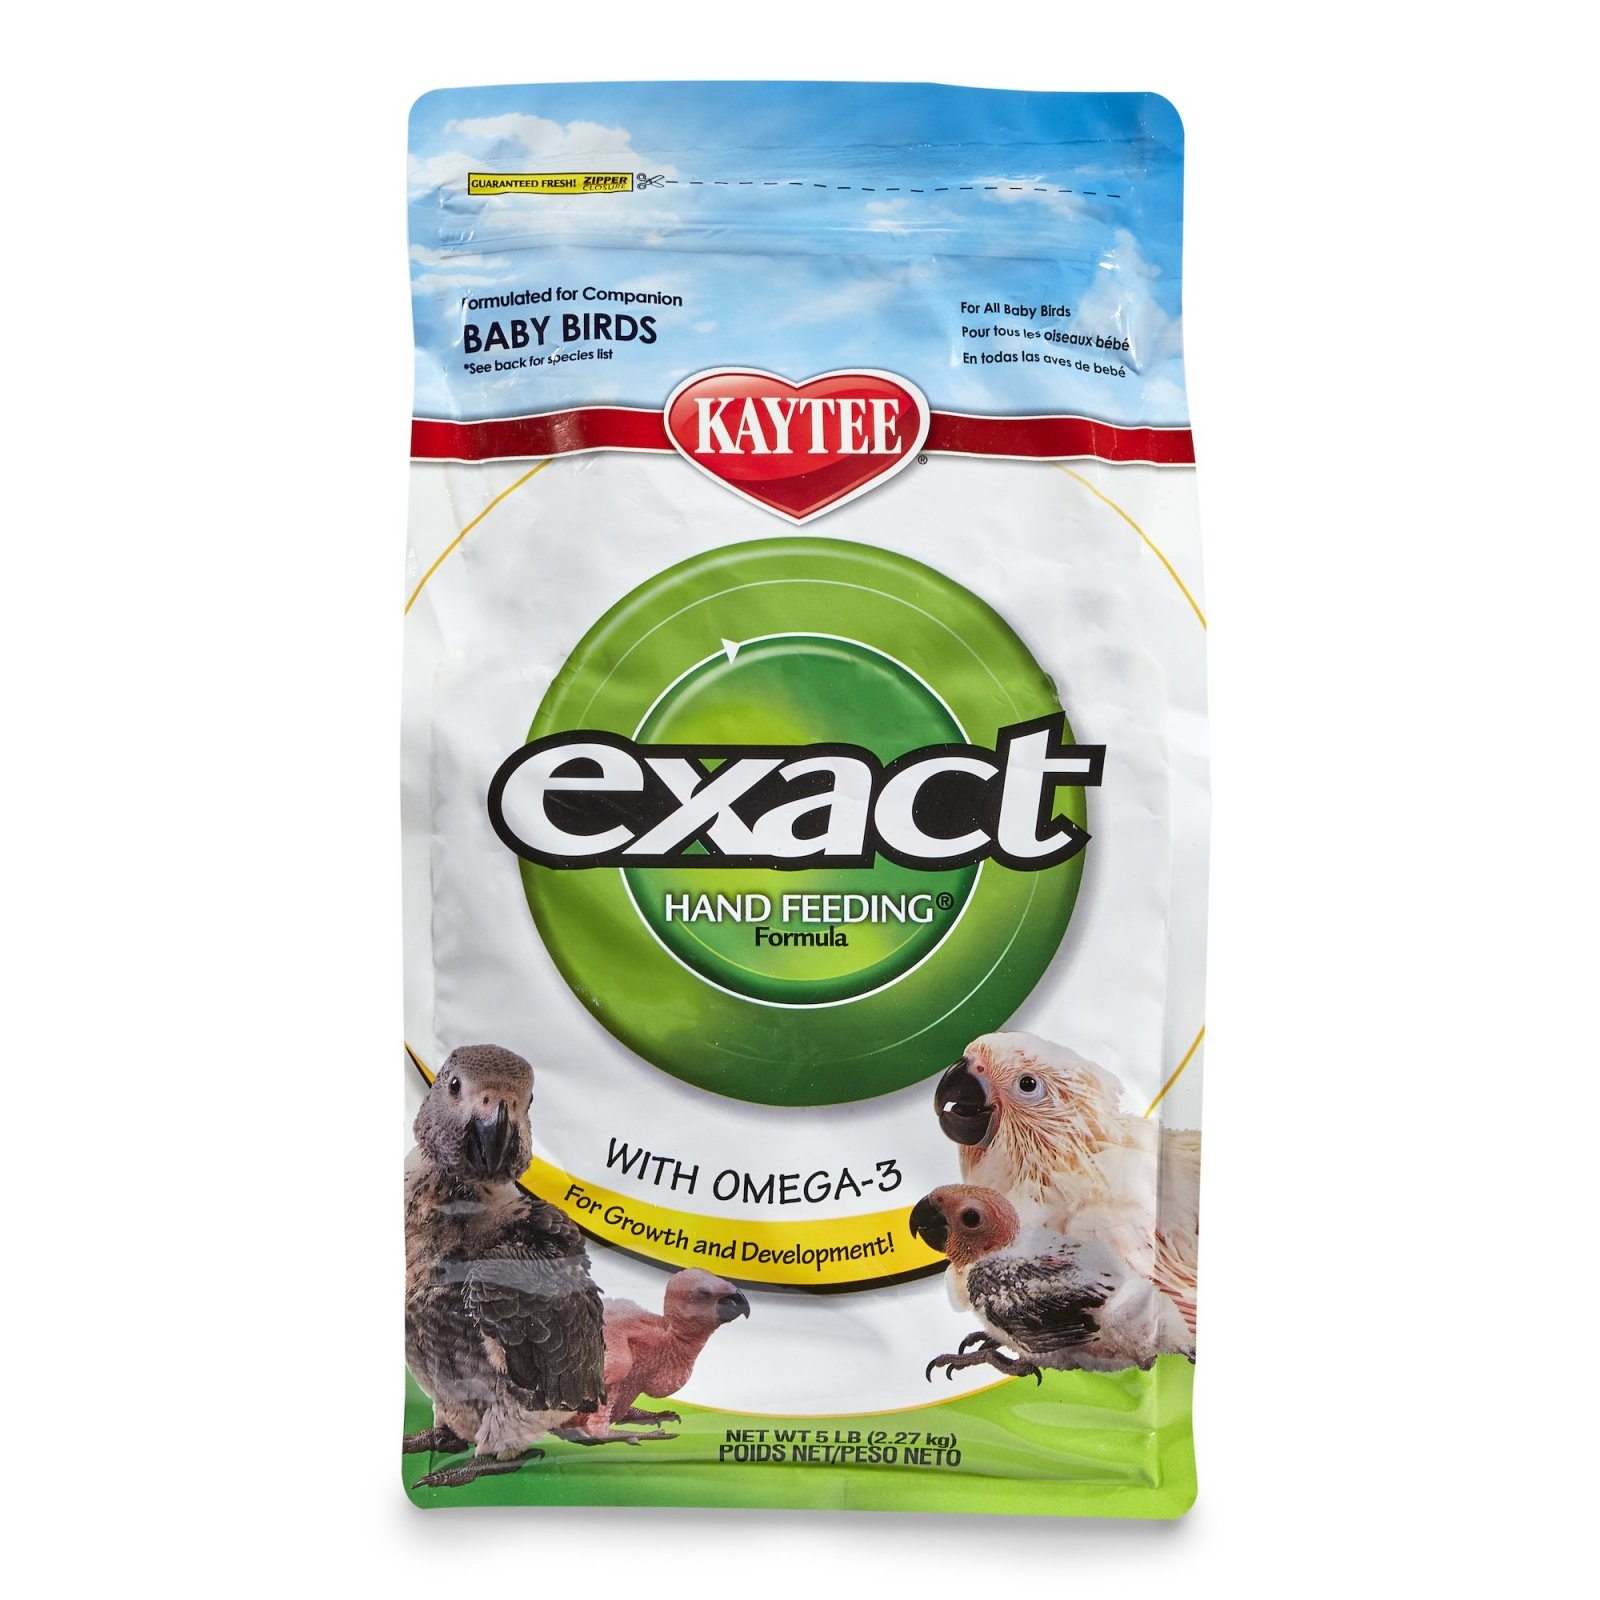 EXACT H/F DIET 5#